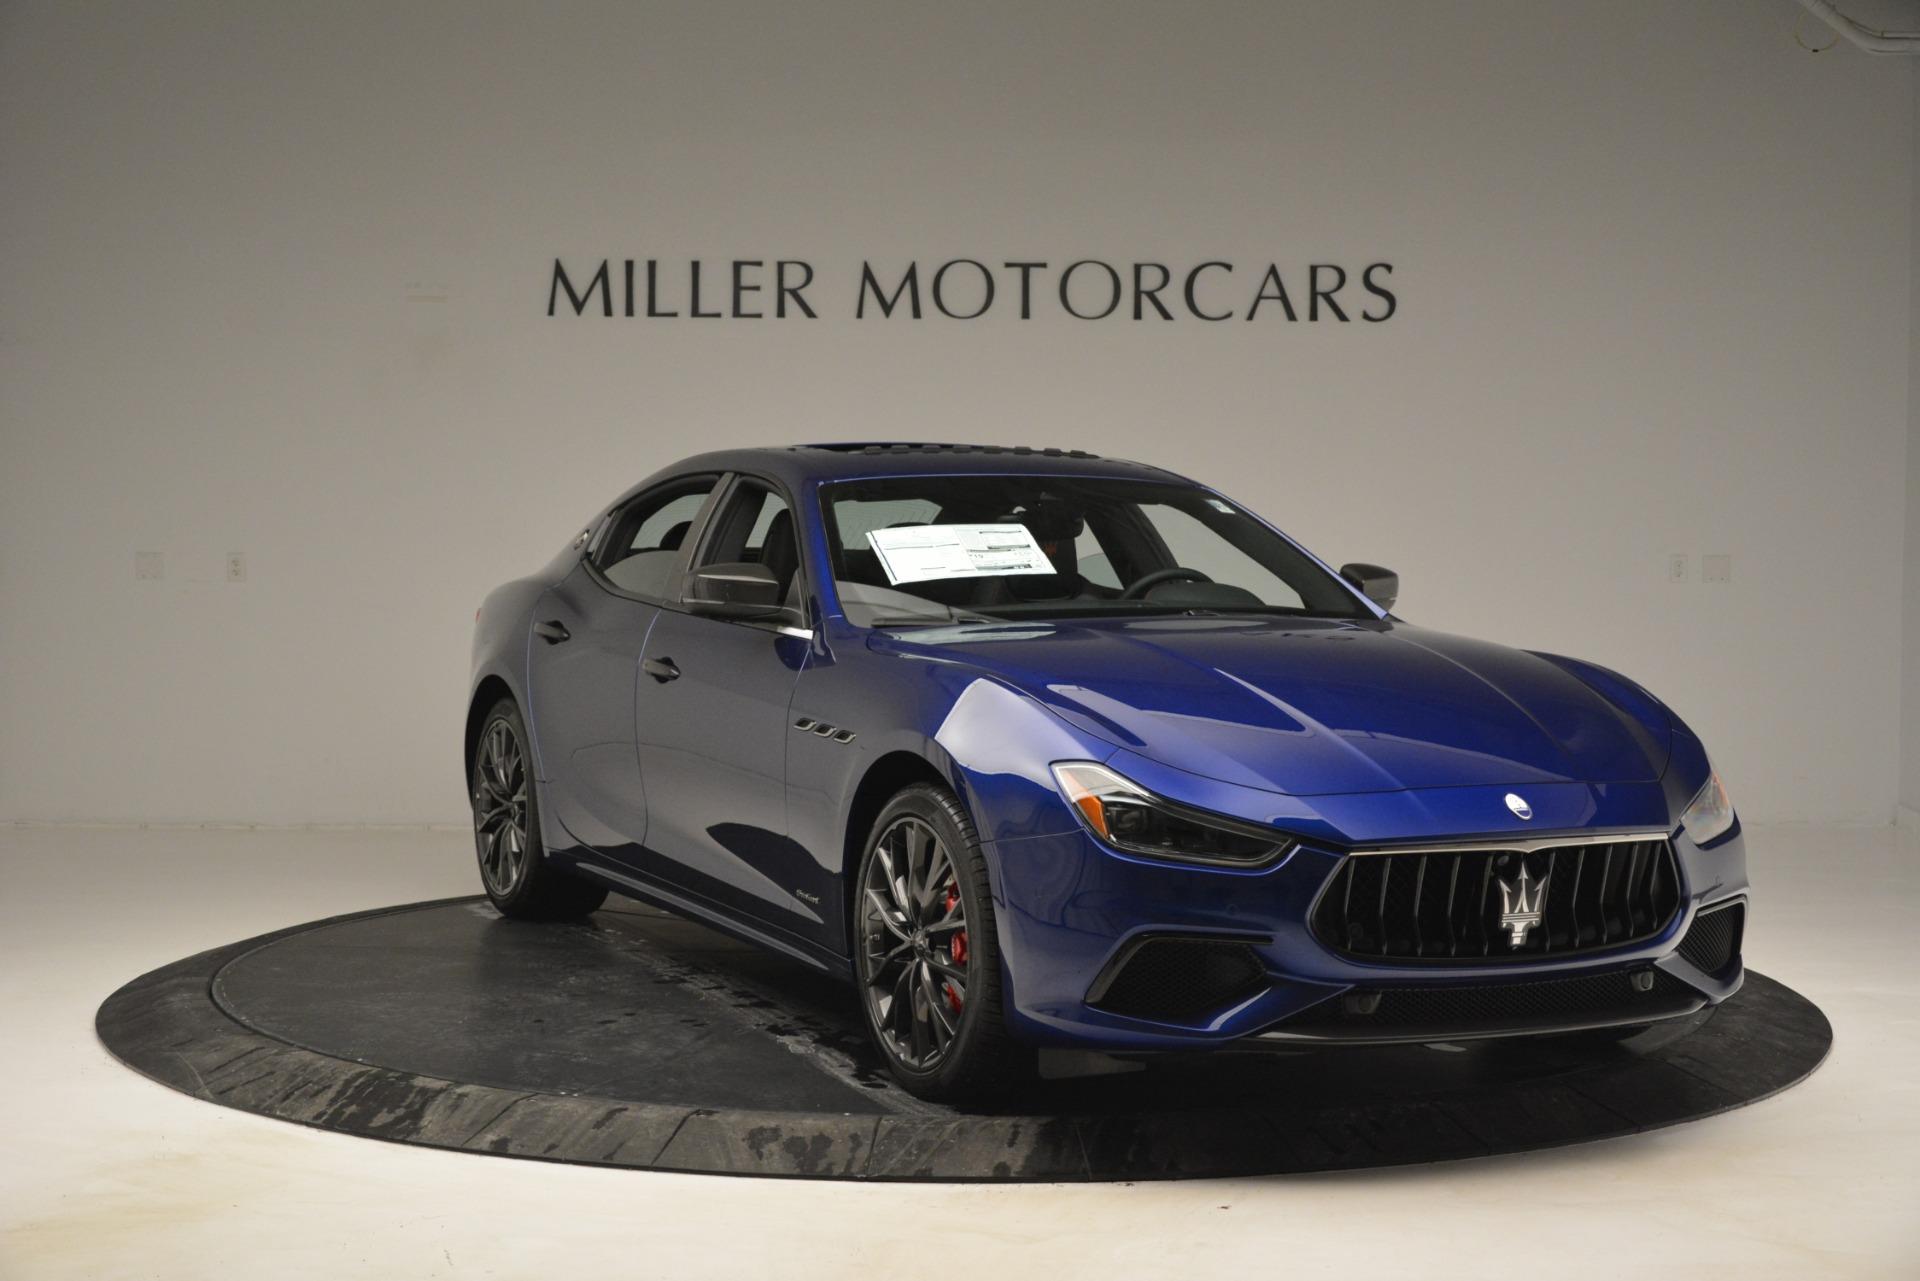 New 2019 Maserati Ghibli S Q4 GranSport For Sale In Greenwich, CT 2978_p11